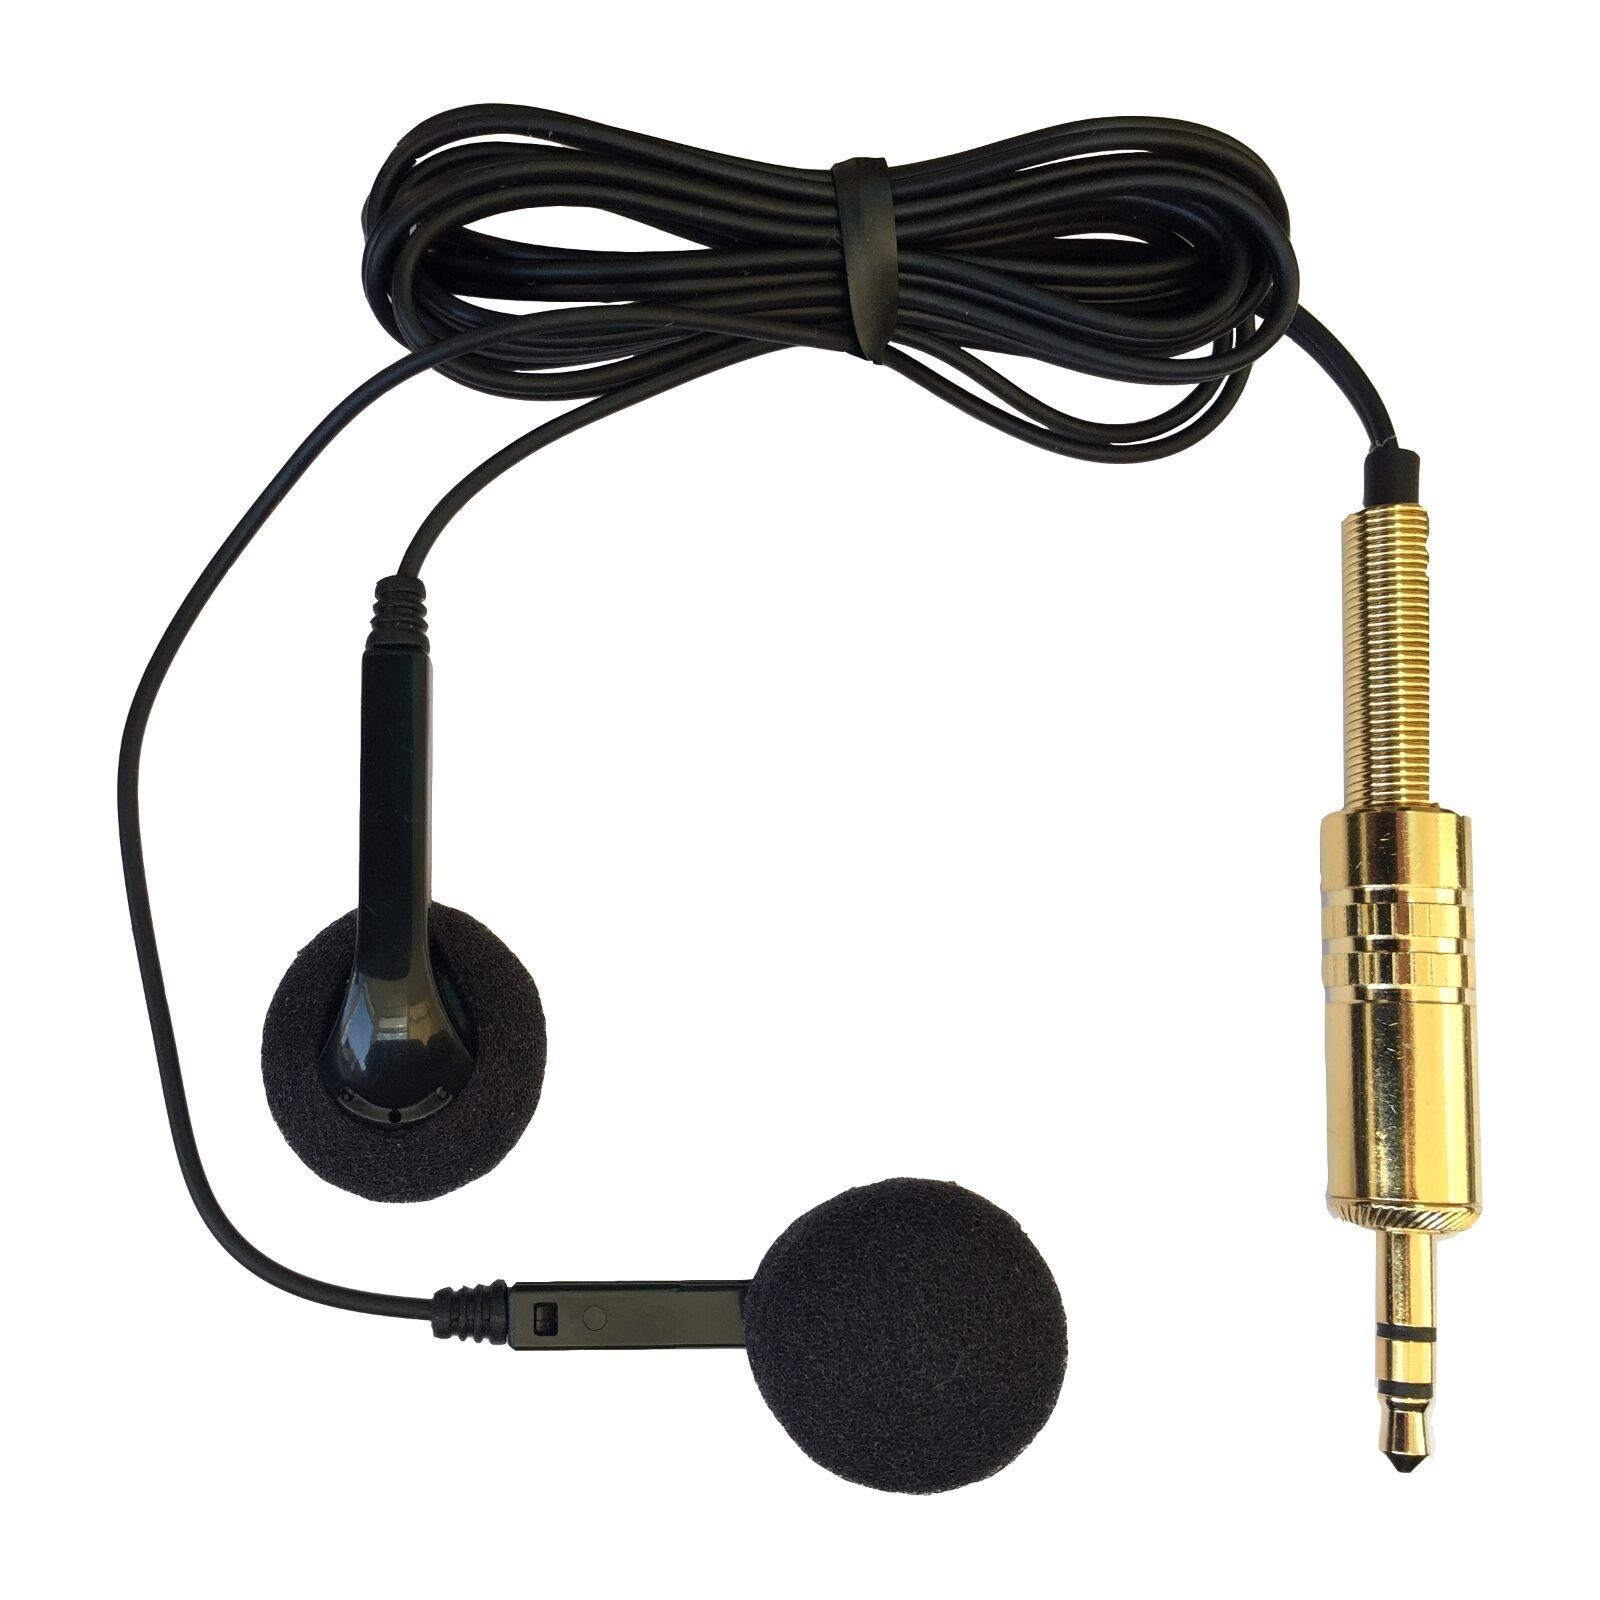 BINAURAL EAR MOUNTED STEREO MICROPHONE HIDDEN INTO HEADPHONES SENSITIVE /& CLEAR